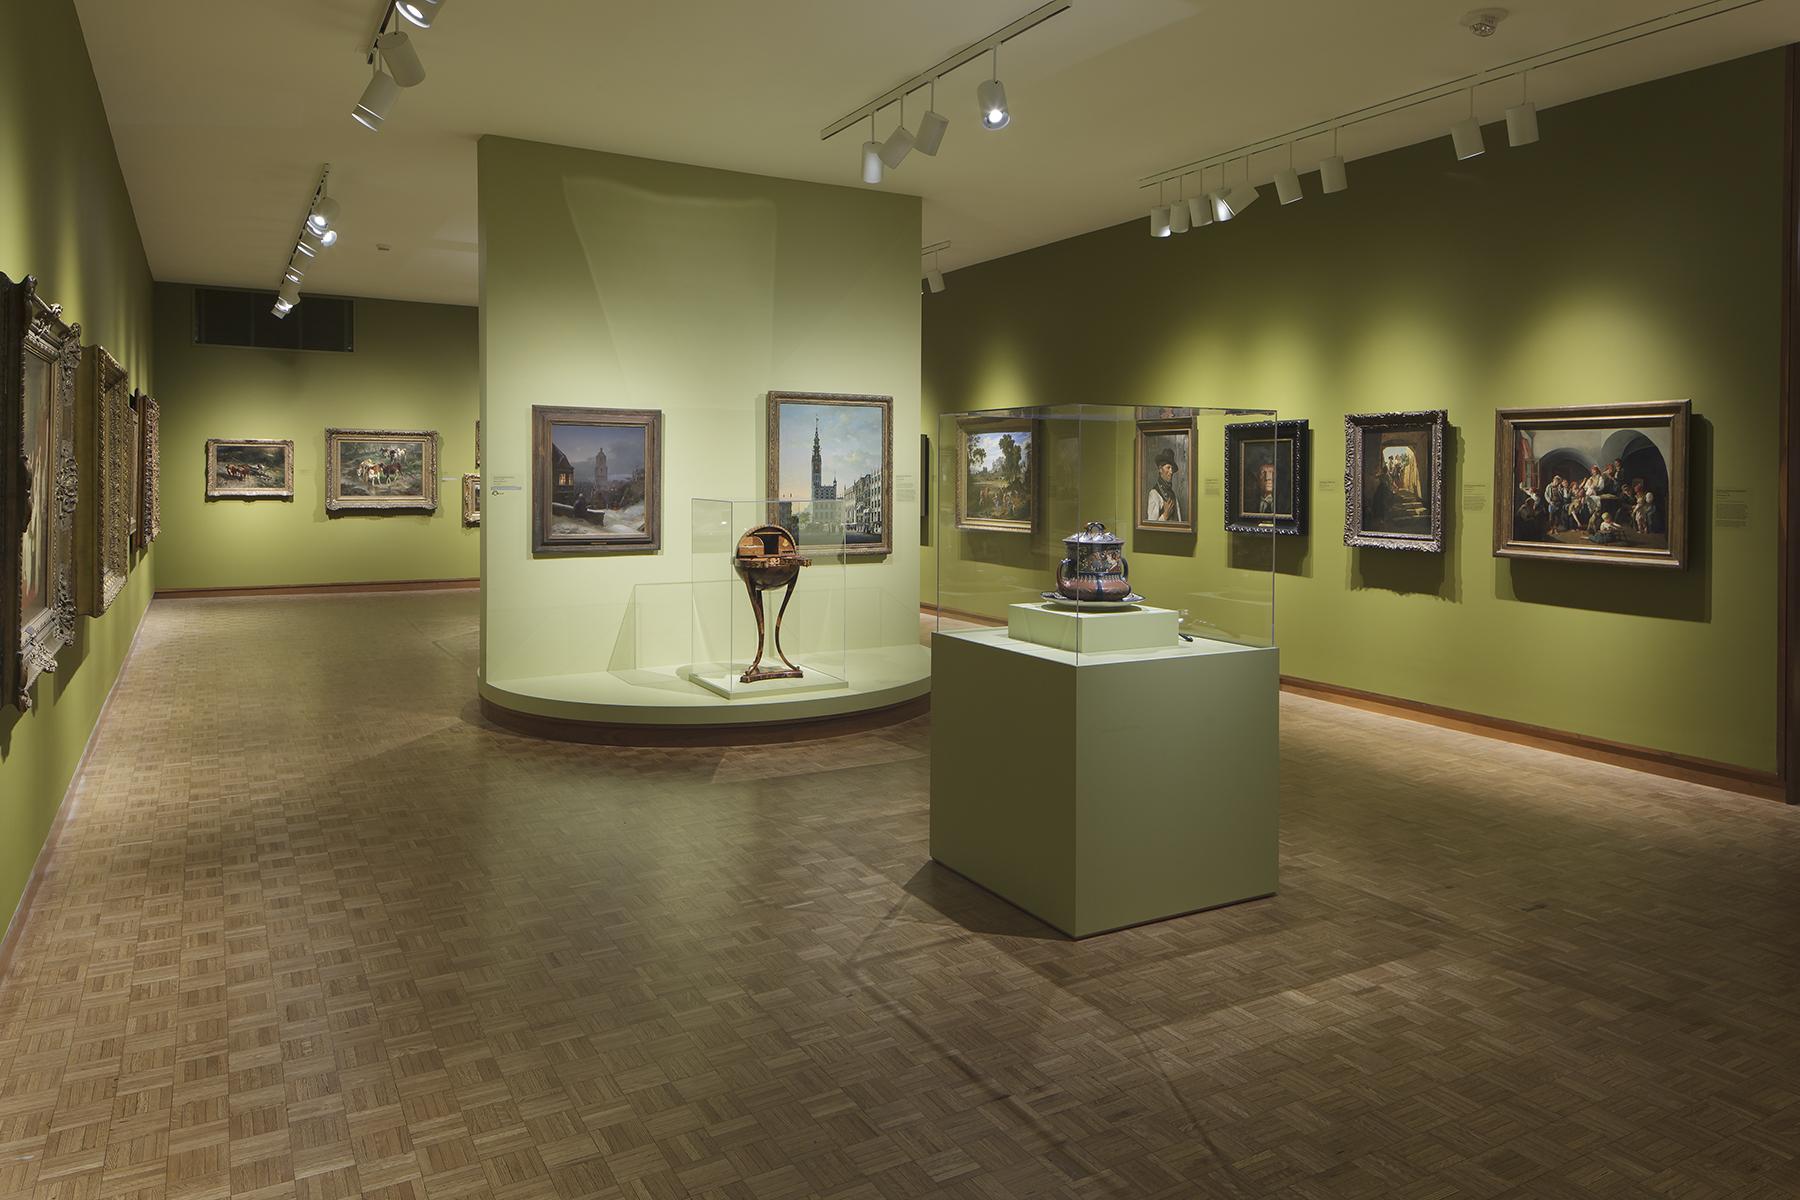 Nineteenth Century German Art Gallery with The Interruption by Ferdinand Georg Waldmüller. Photo credit: John R. Glembin.